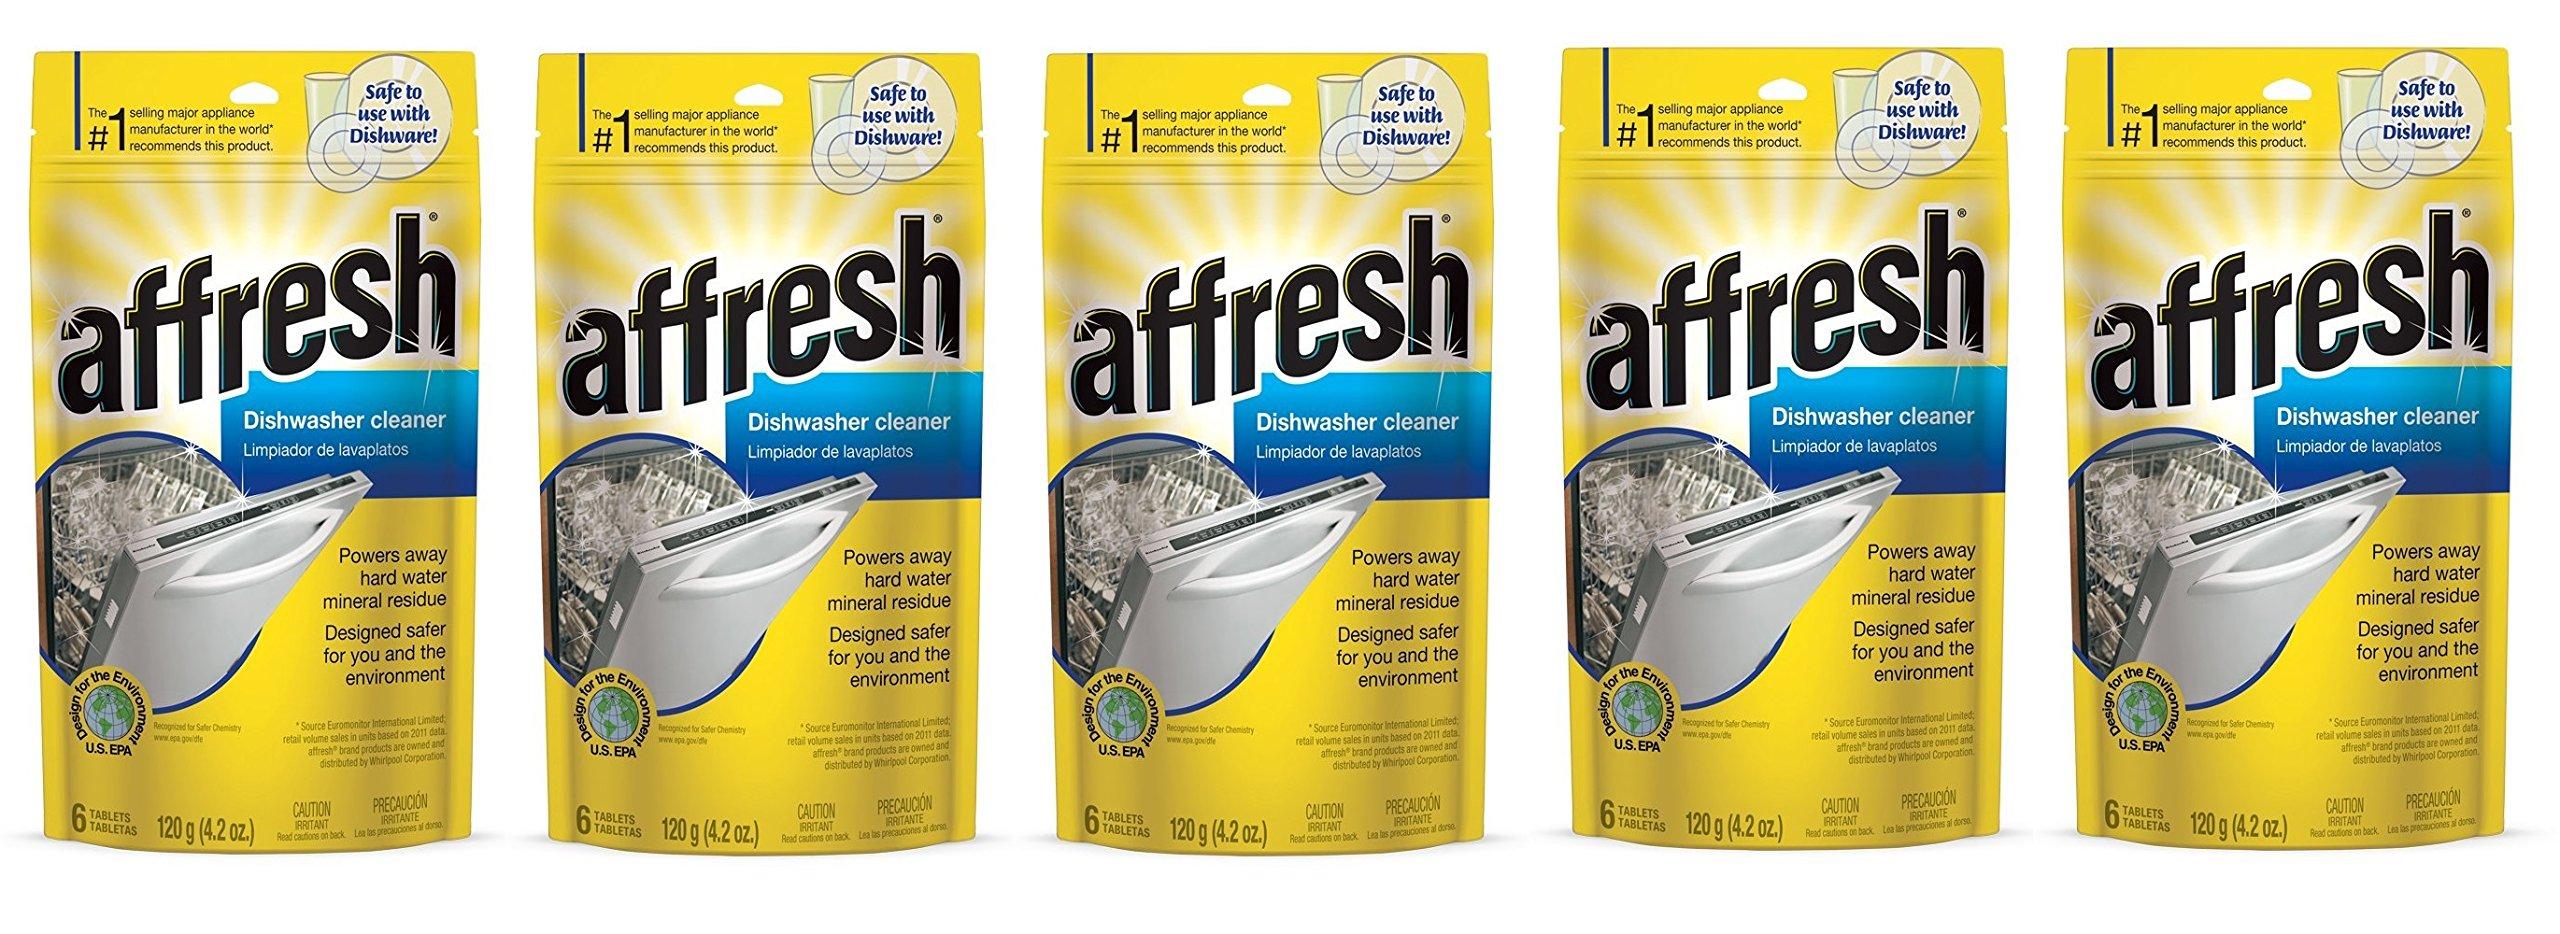 Affresh W10549850 Dishwasher Cleaner onkIkt, 30 Tablets in Pouch